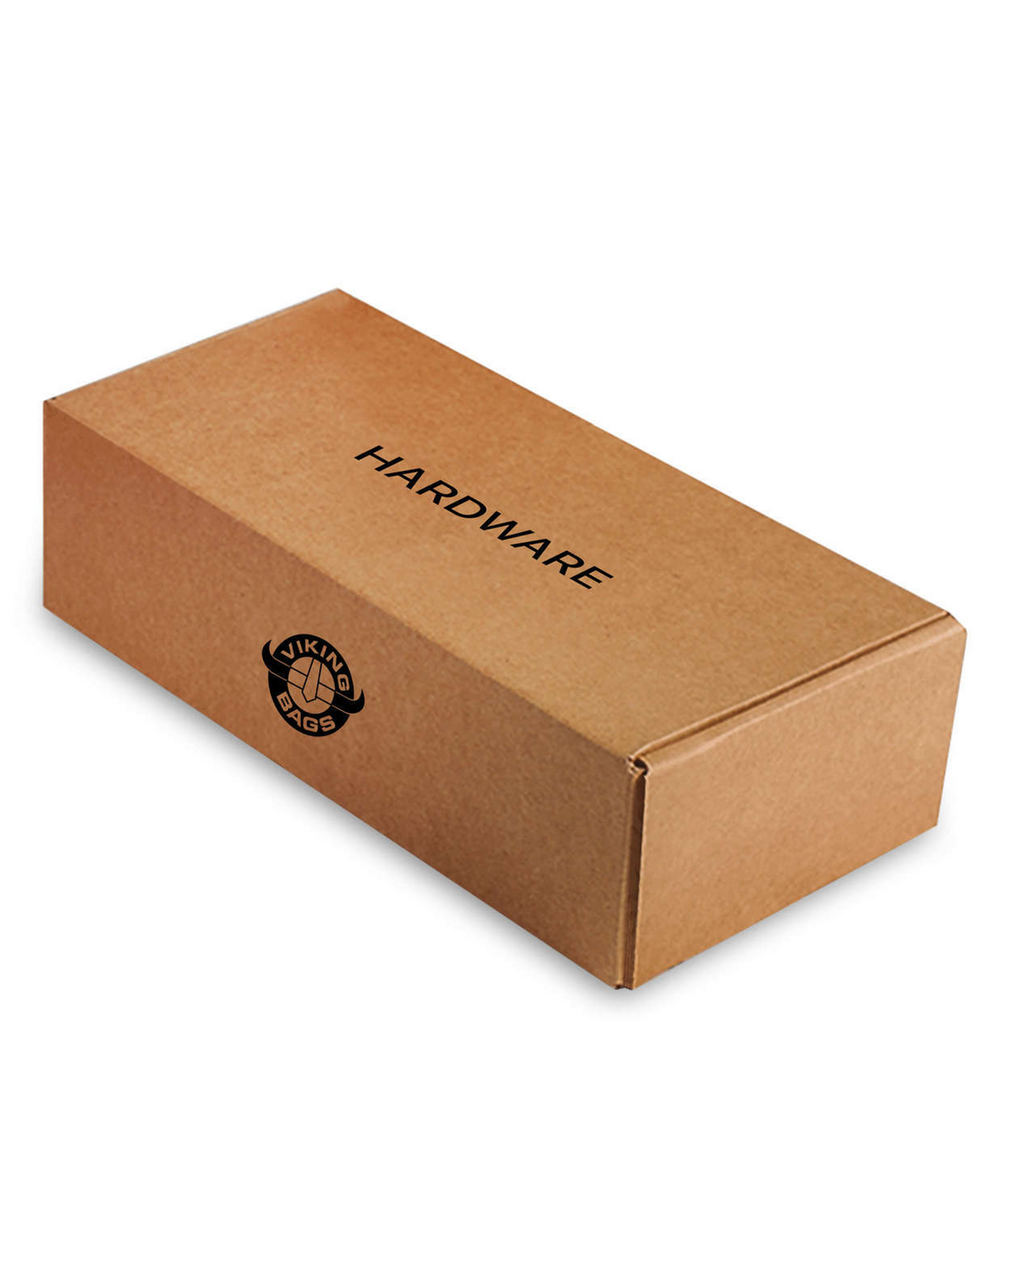 Honda 1100 Shadow Sabre Charger Slanted Medium Motorcycle Saddlebags Hardware box